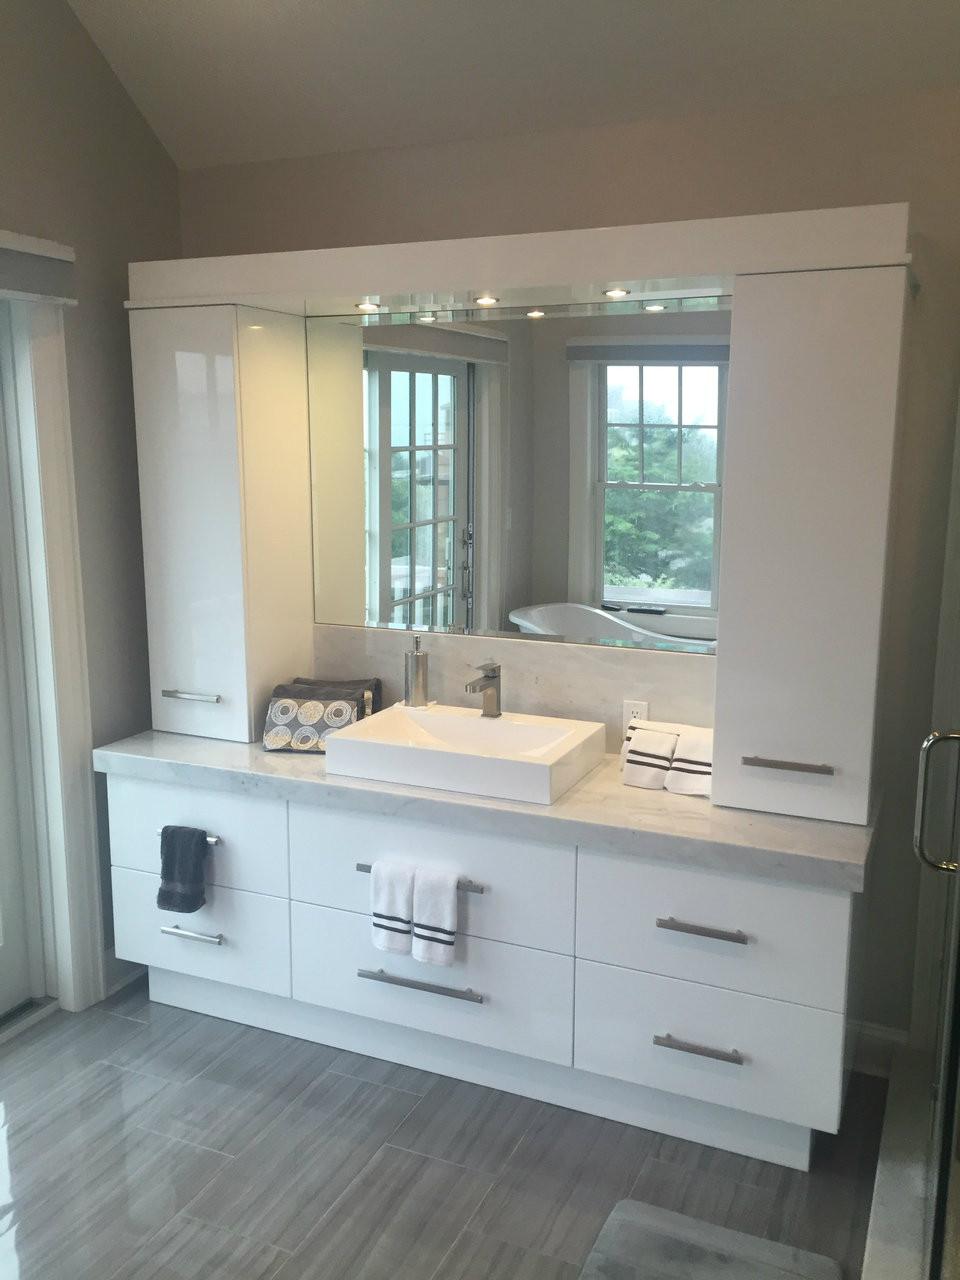 Custom Bathroom Vanity With Cabinets